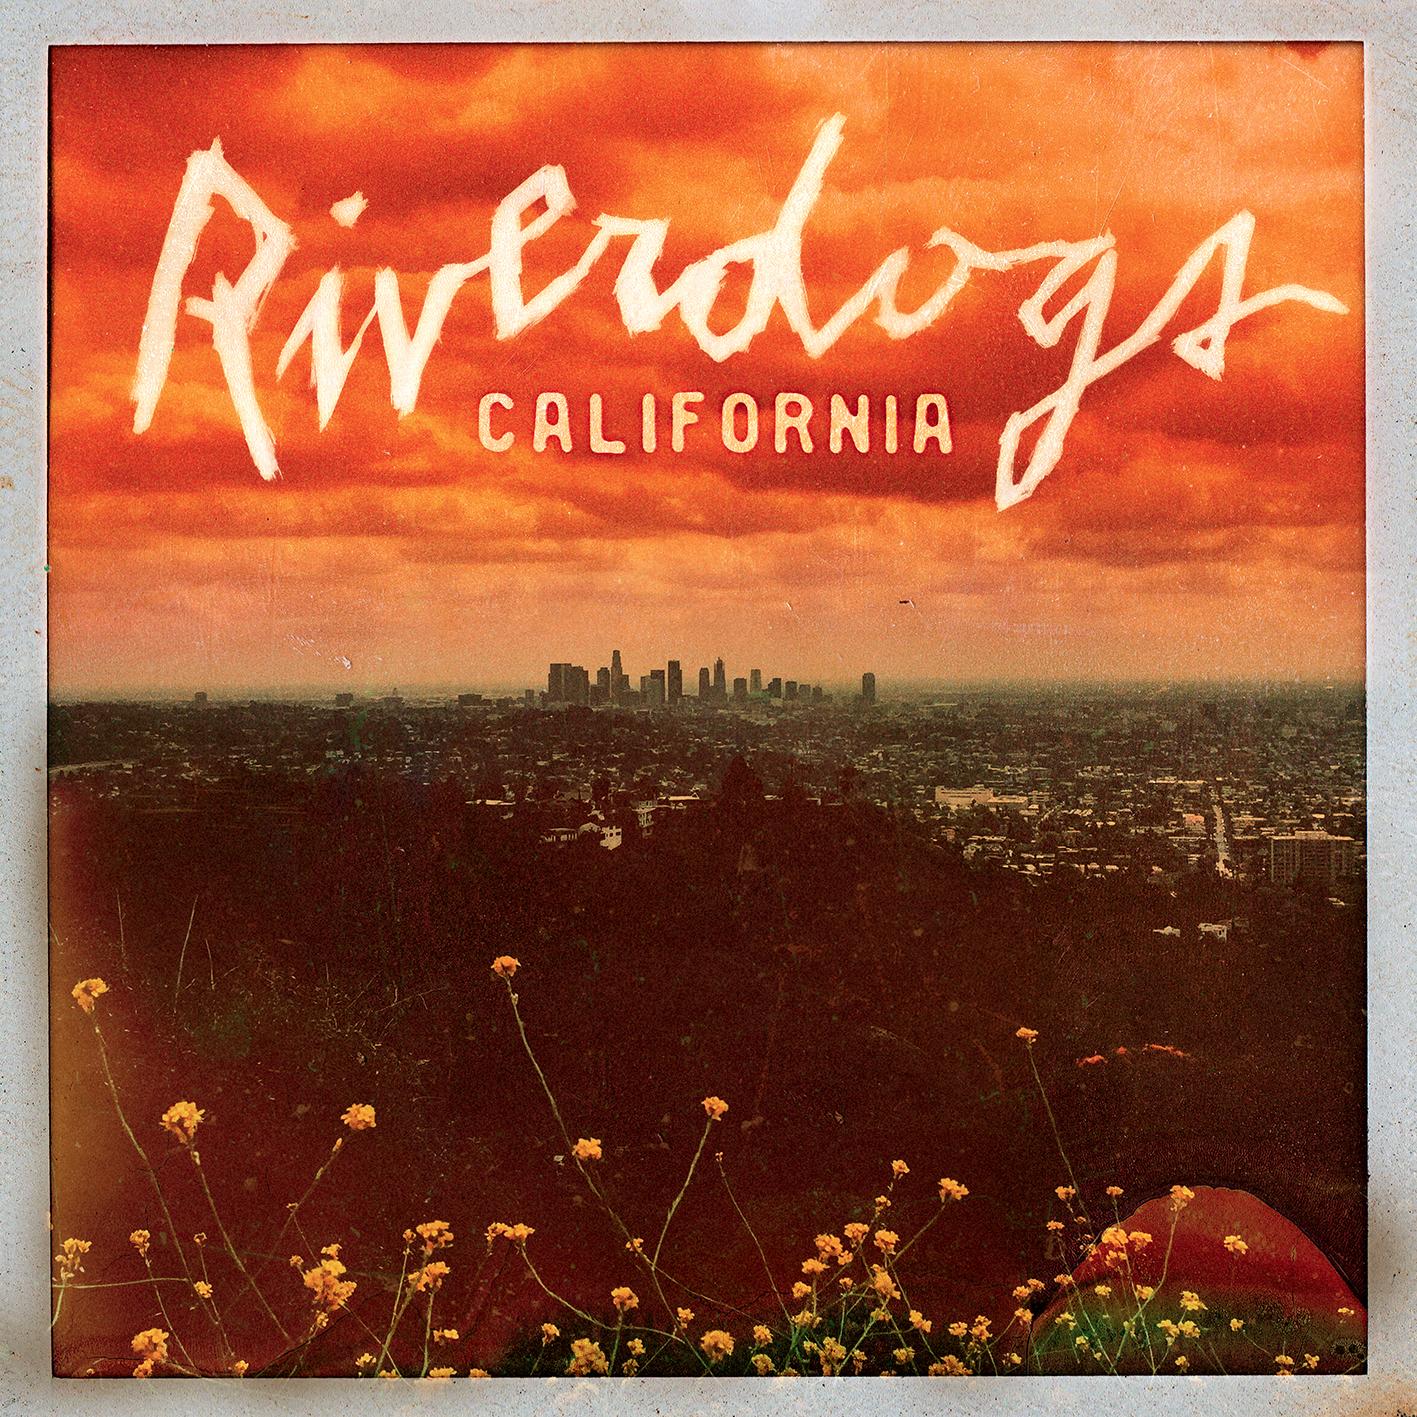 RIVERDOGS_California_Cover HI